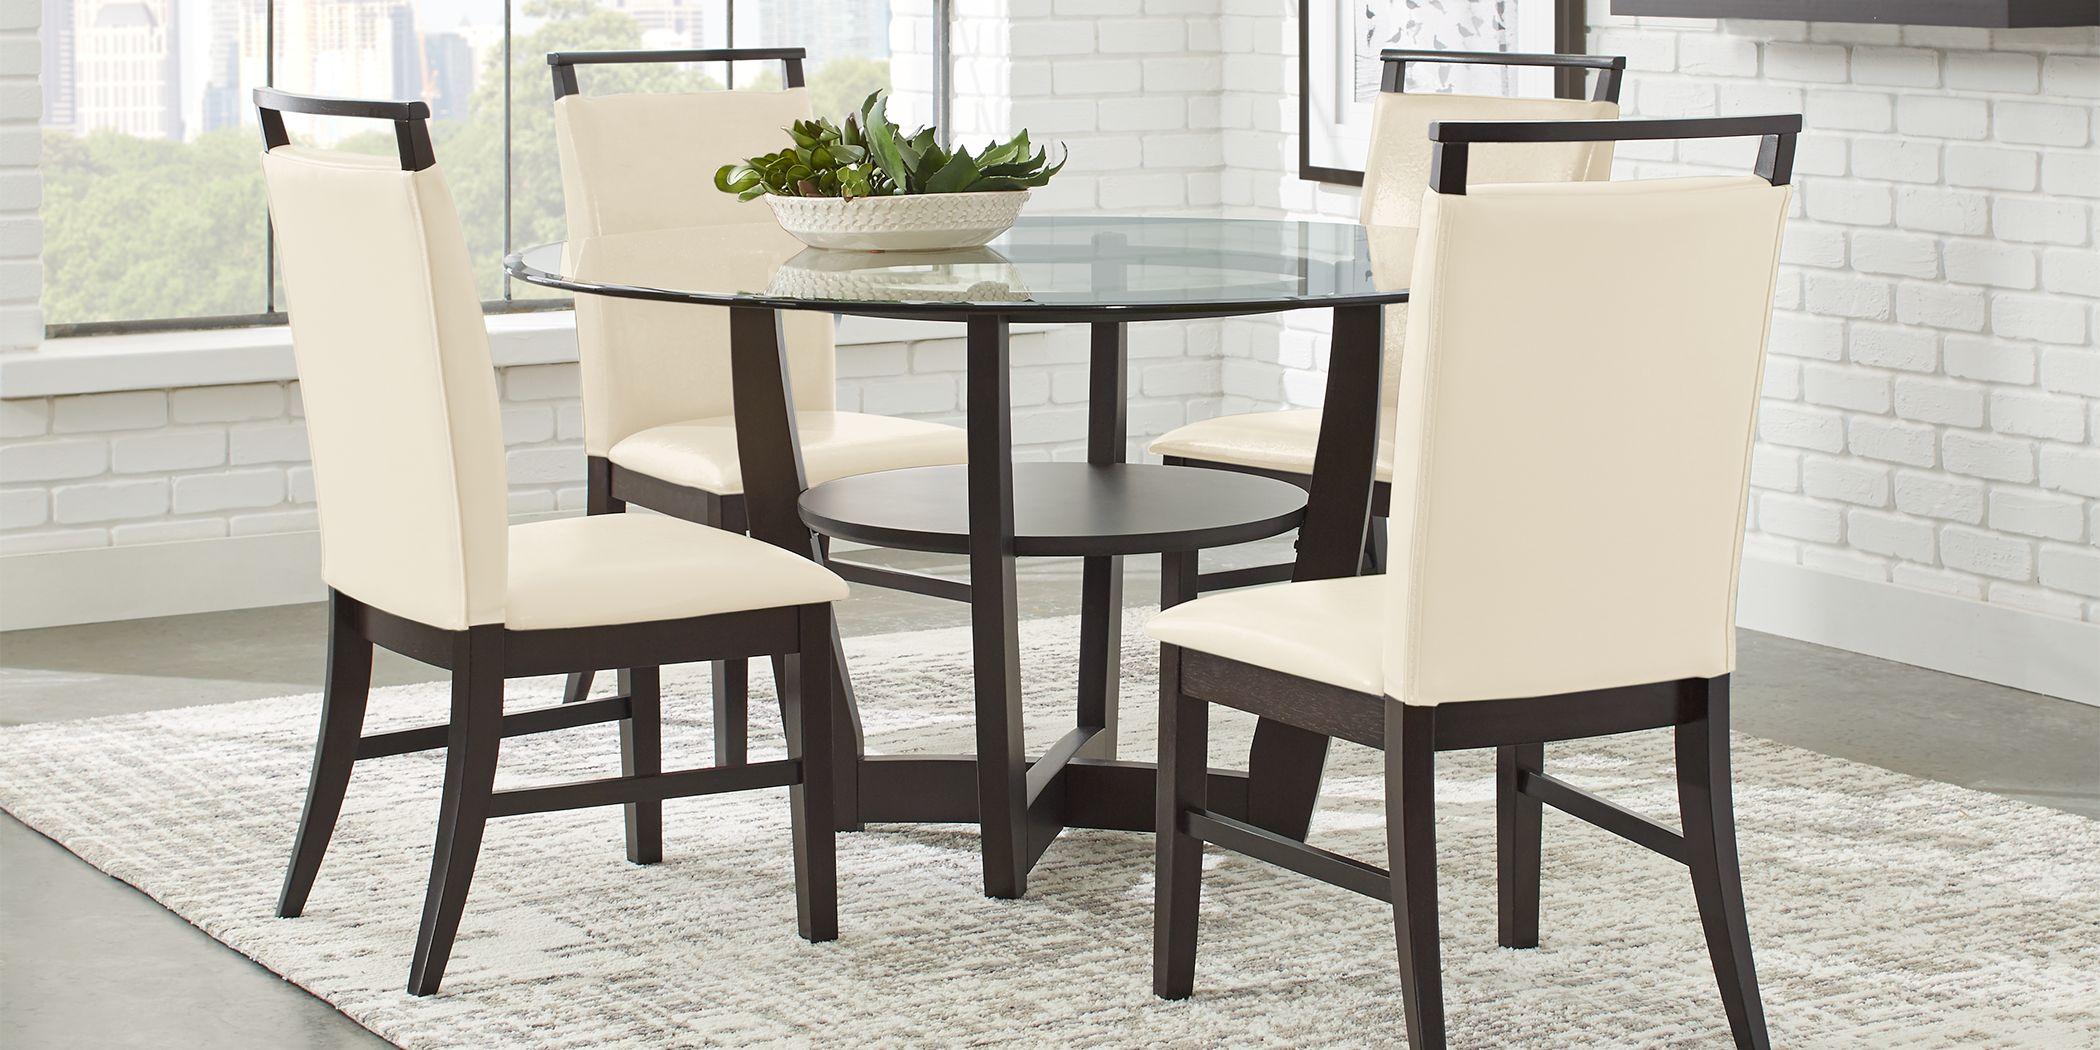 "Ciara Espresso 5 Pc 54"" Round Dining Set with Cream Chairs"